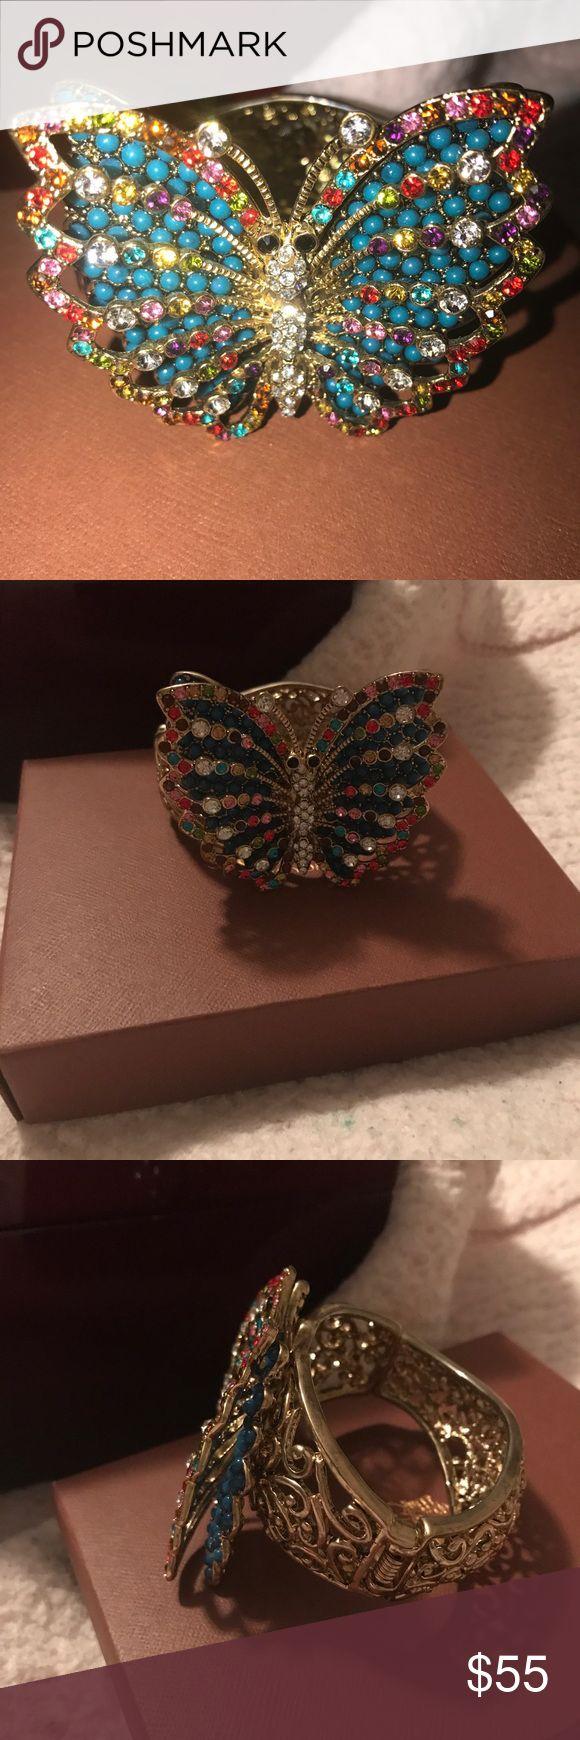 Butterfly bracelet Lots of gorgeous color hsn Jewelry Bracelets